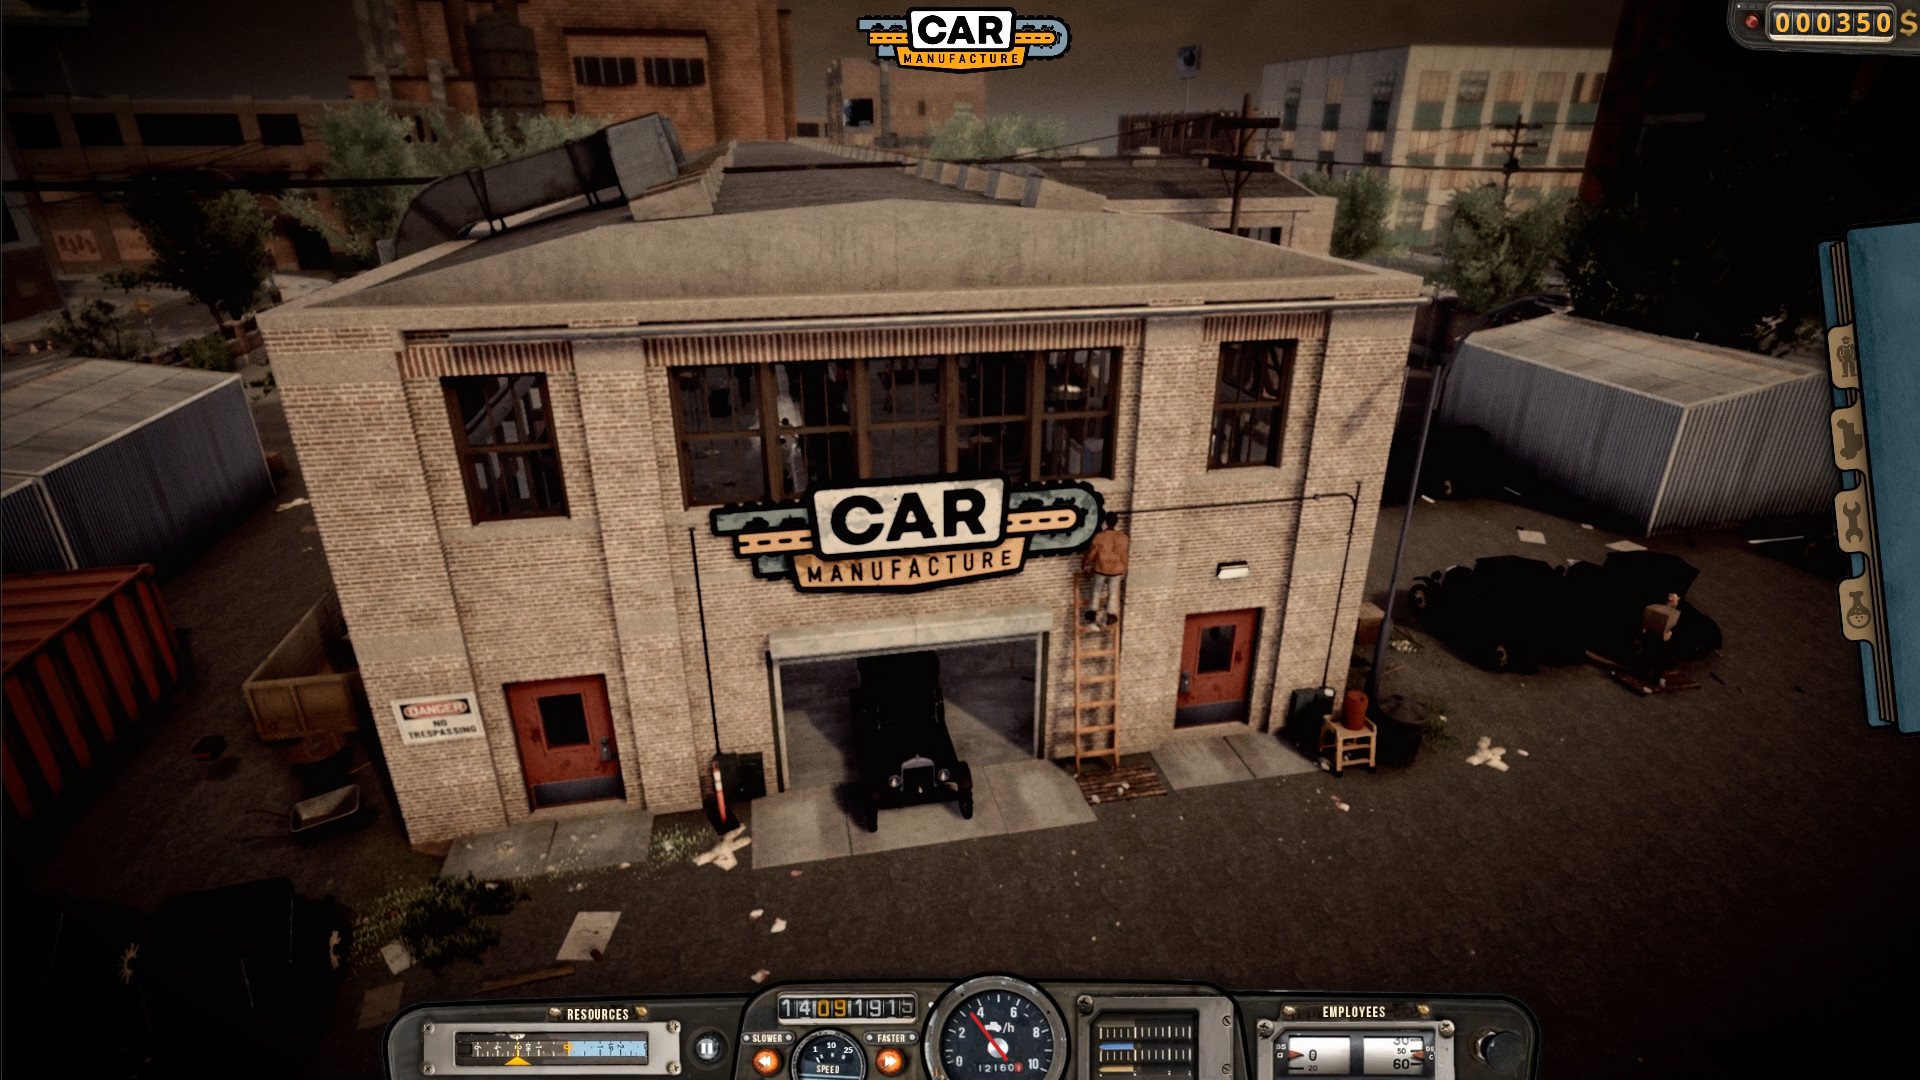 Build A Car Game >> Car Manufacture On Steam